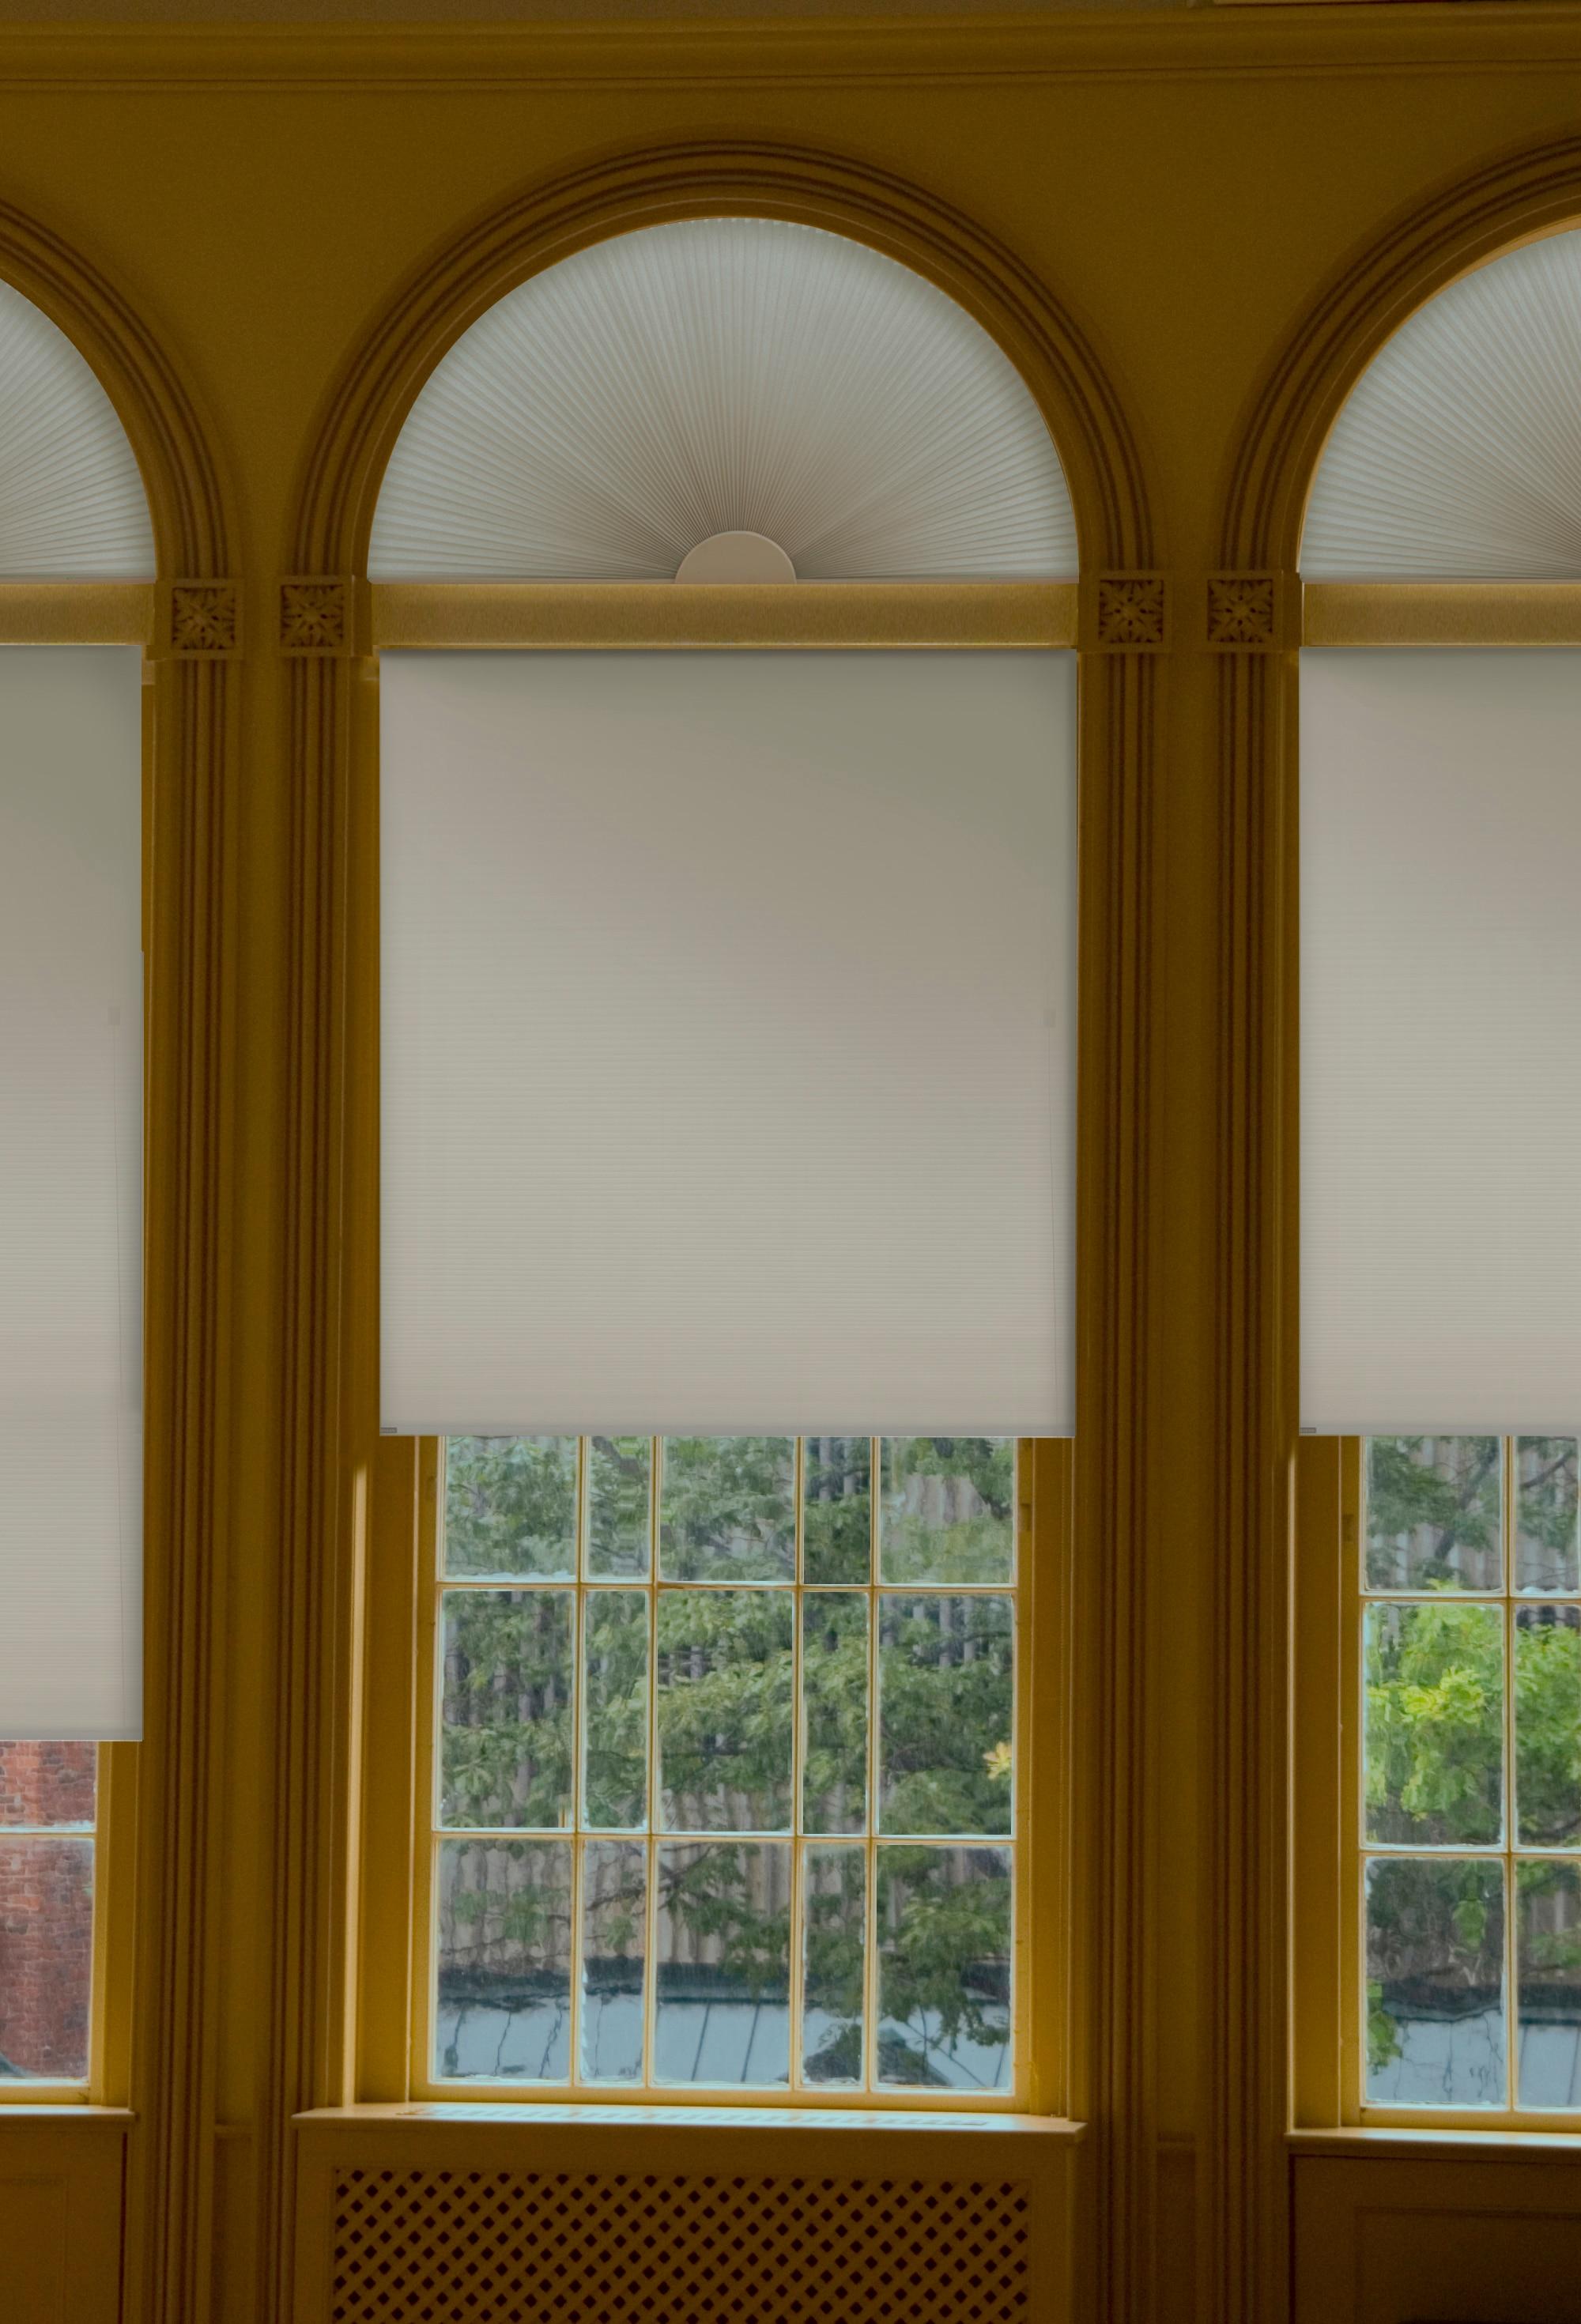 shades are baritone insulating vermont in and darkening light honeycomb cellular java window product room comfortex filtering ecosmart efficient stylish